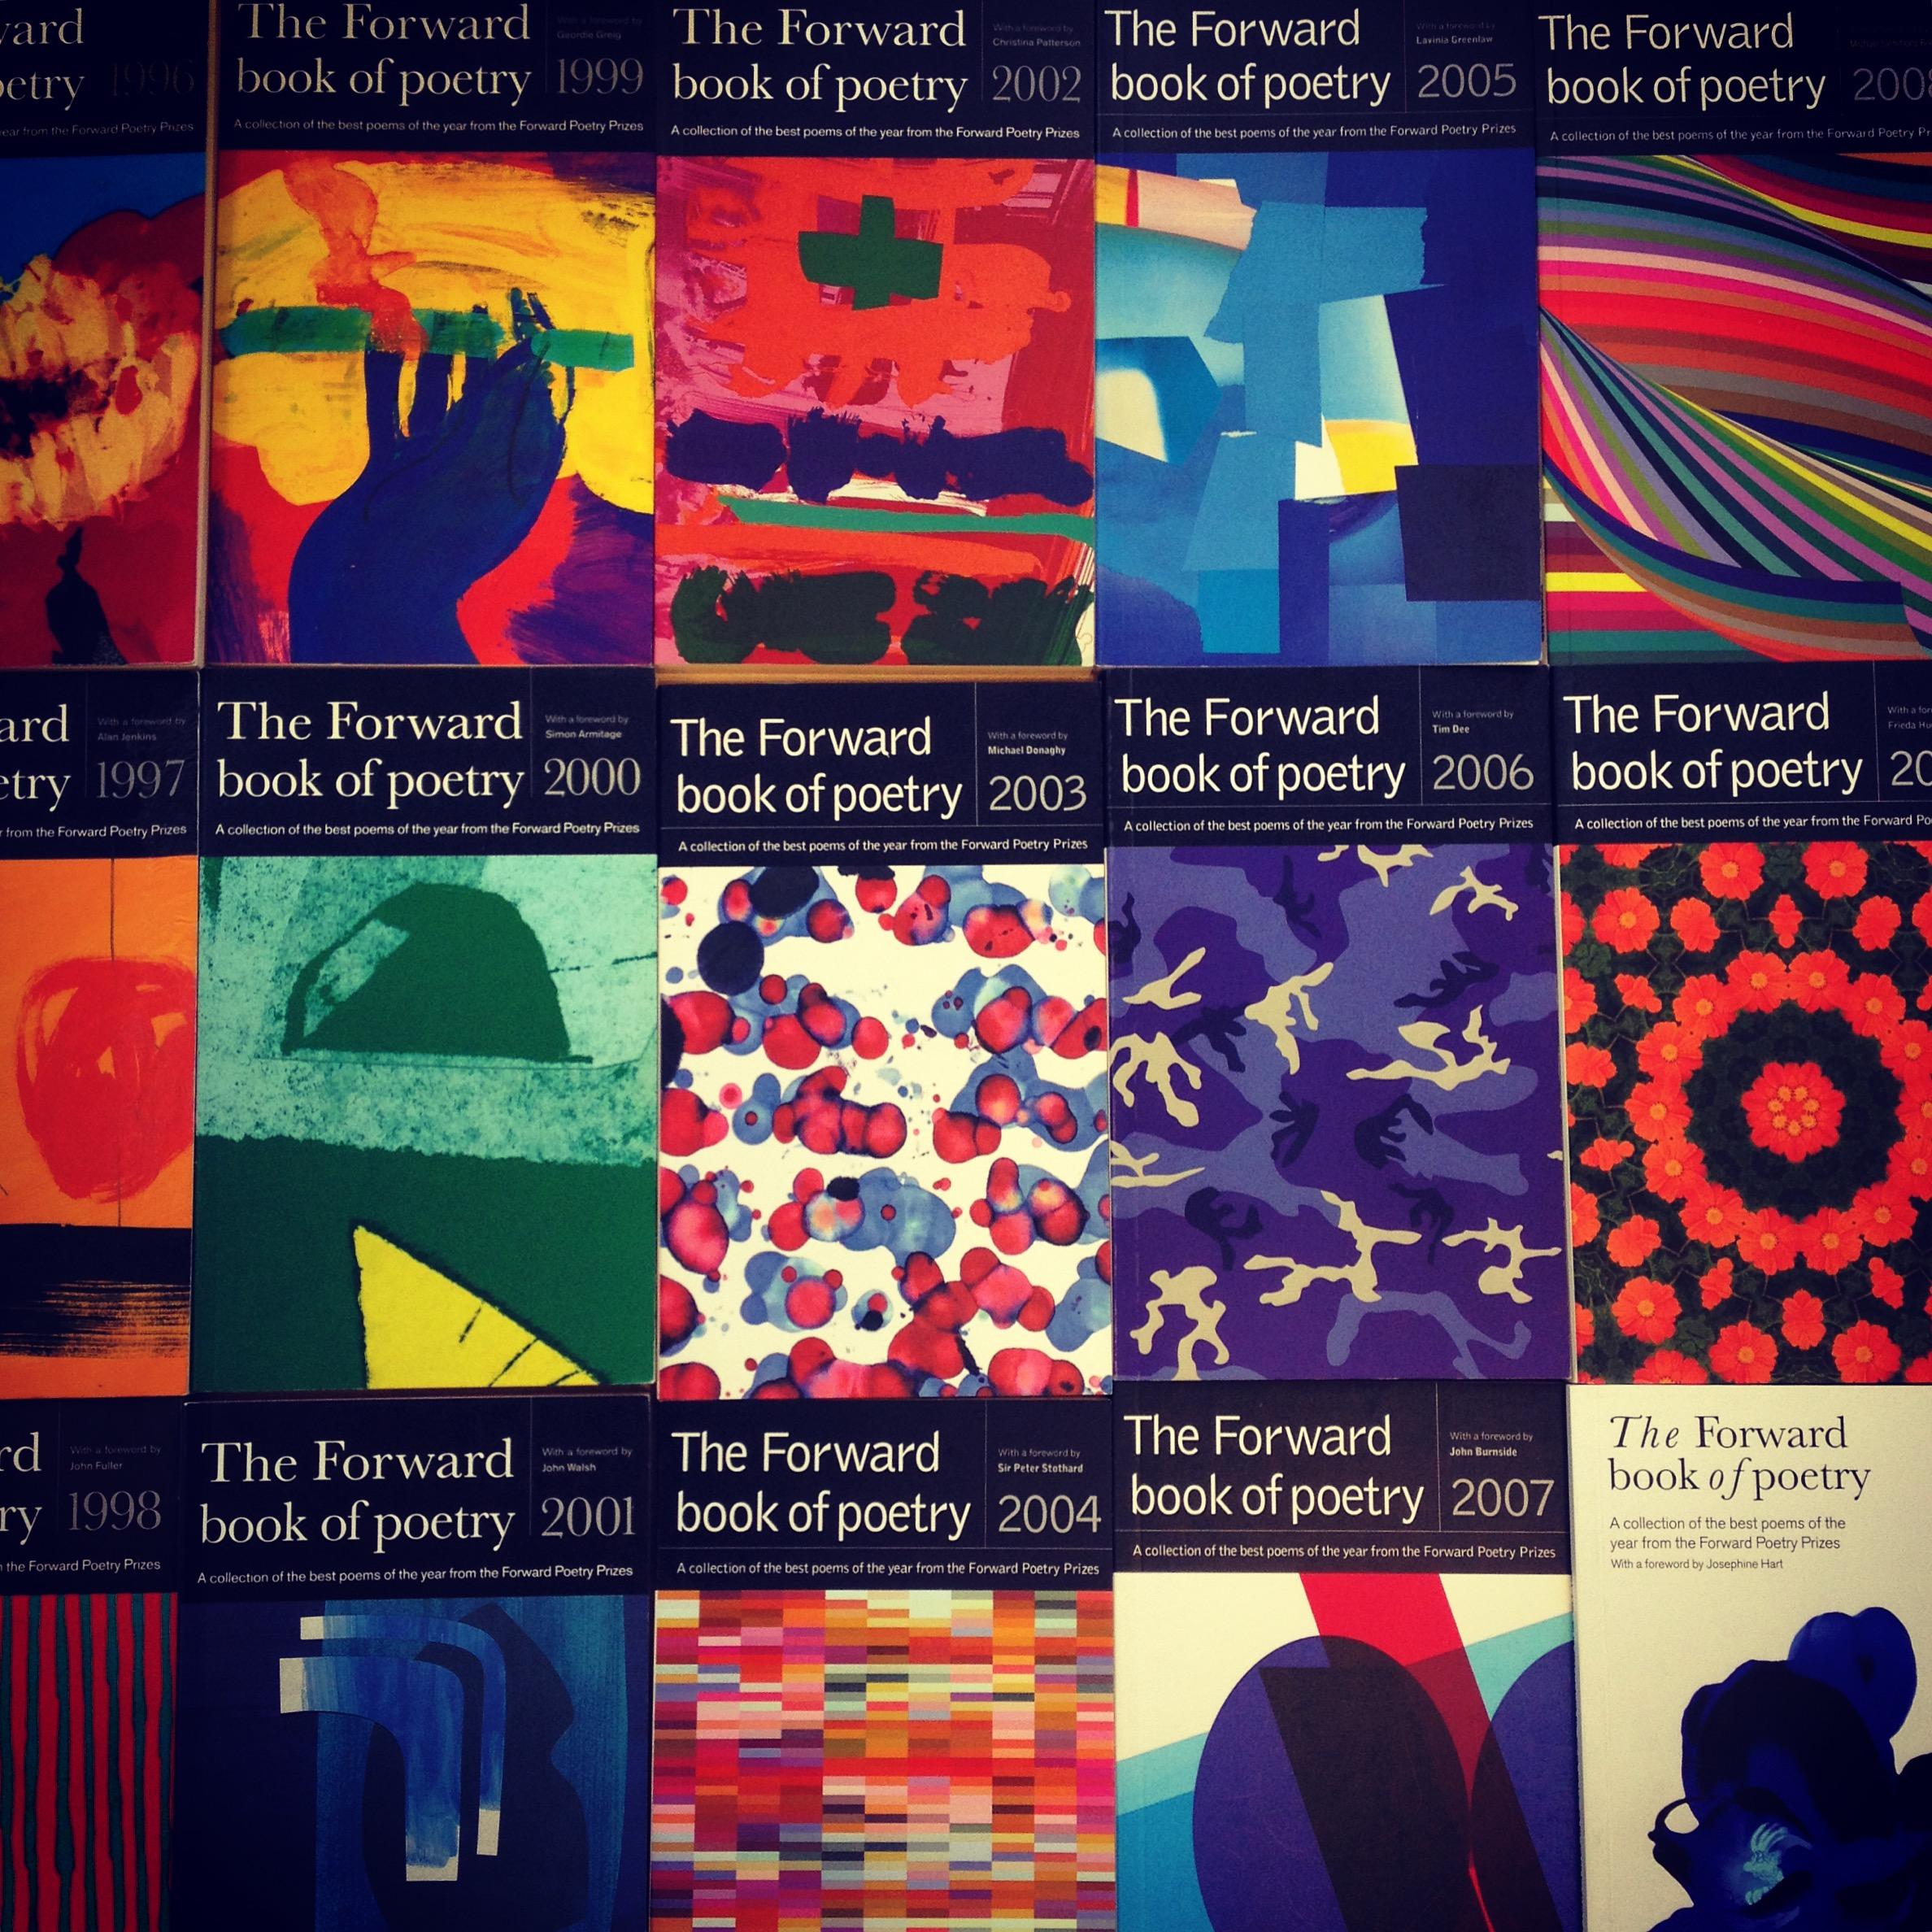 FWD books.jpg